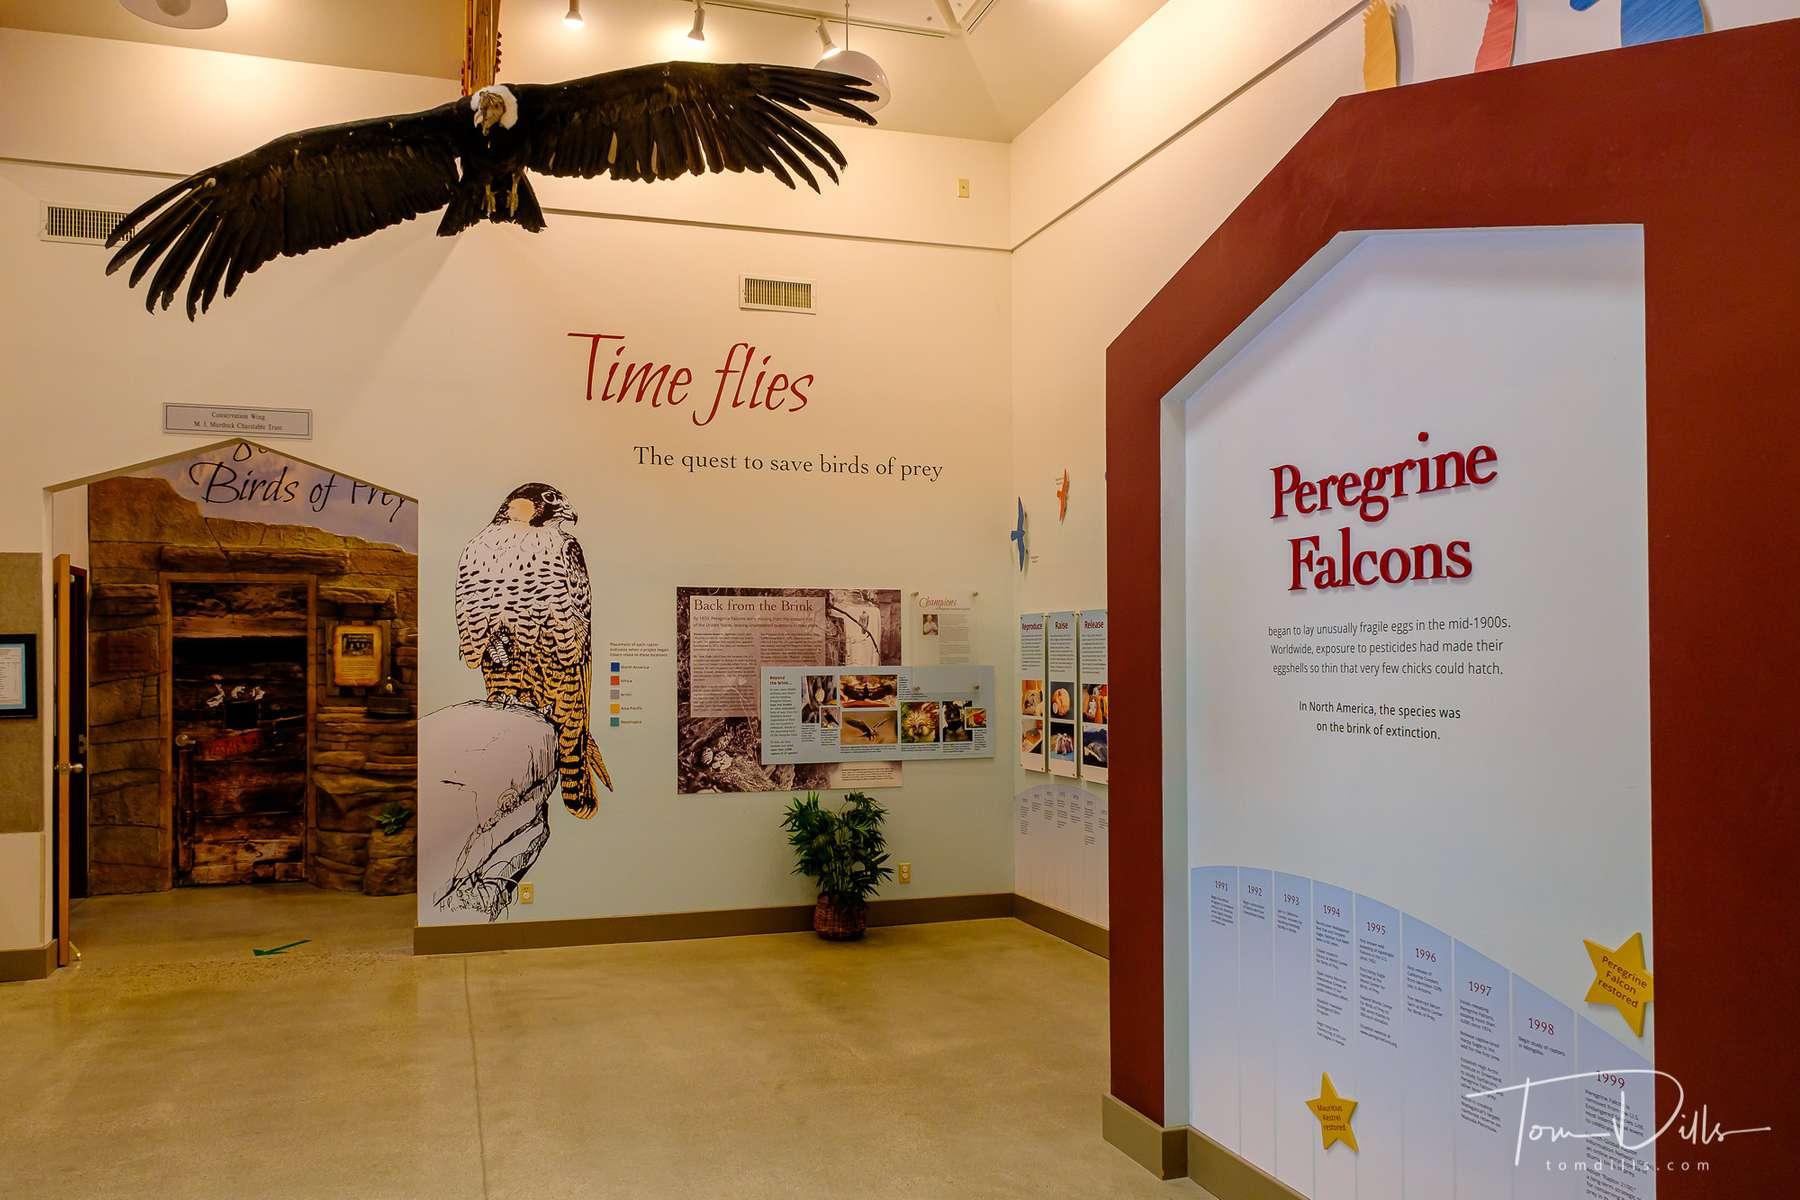 World Center for Birds of Prey in Boise, Idaho